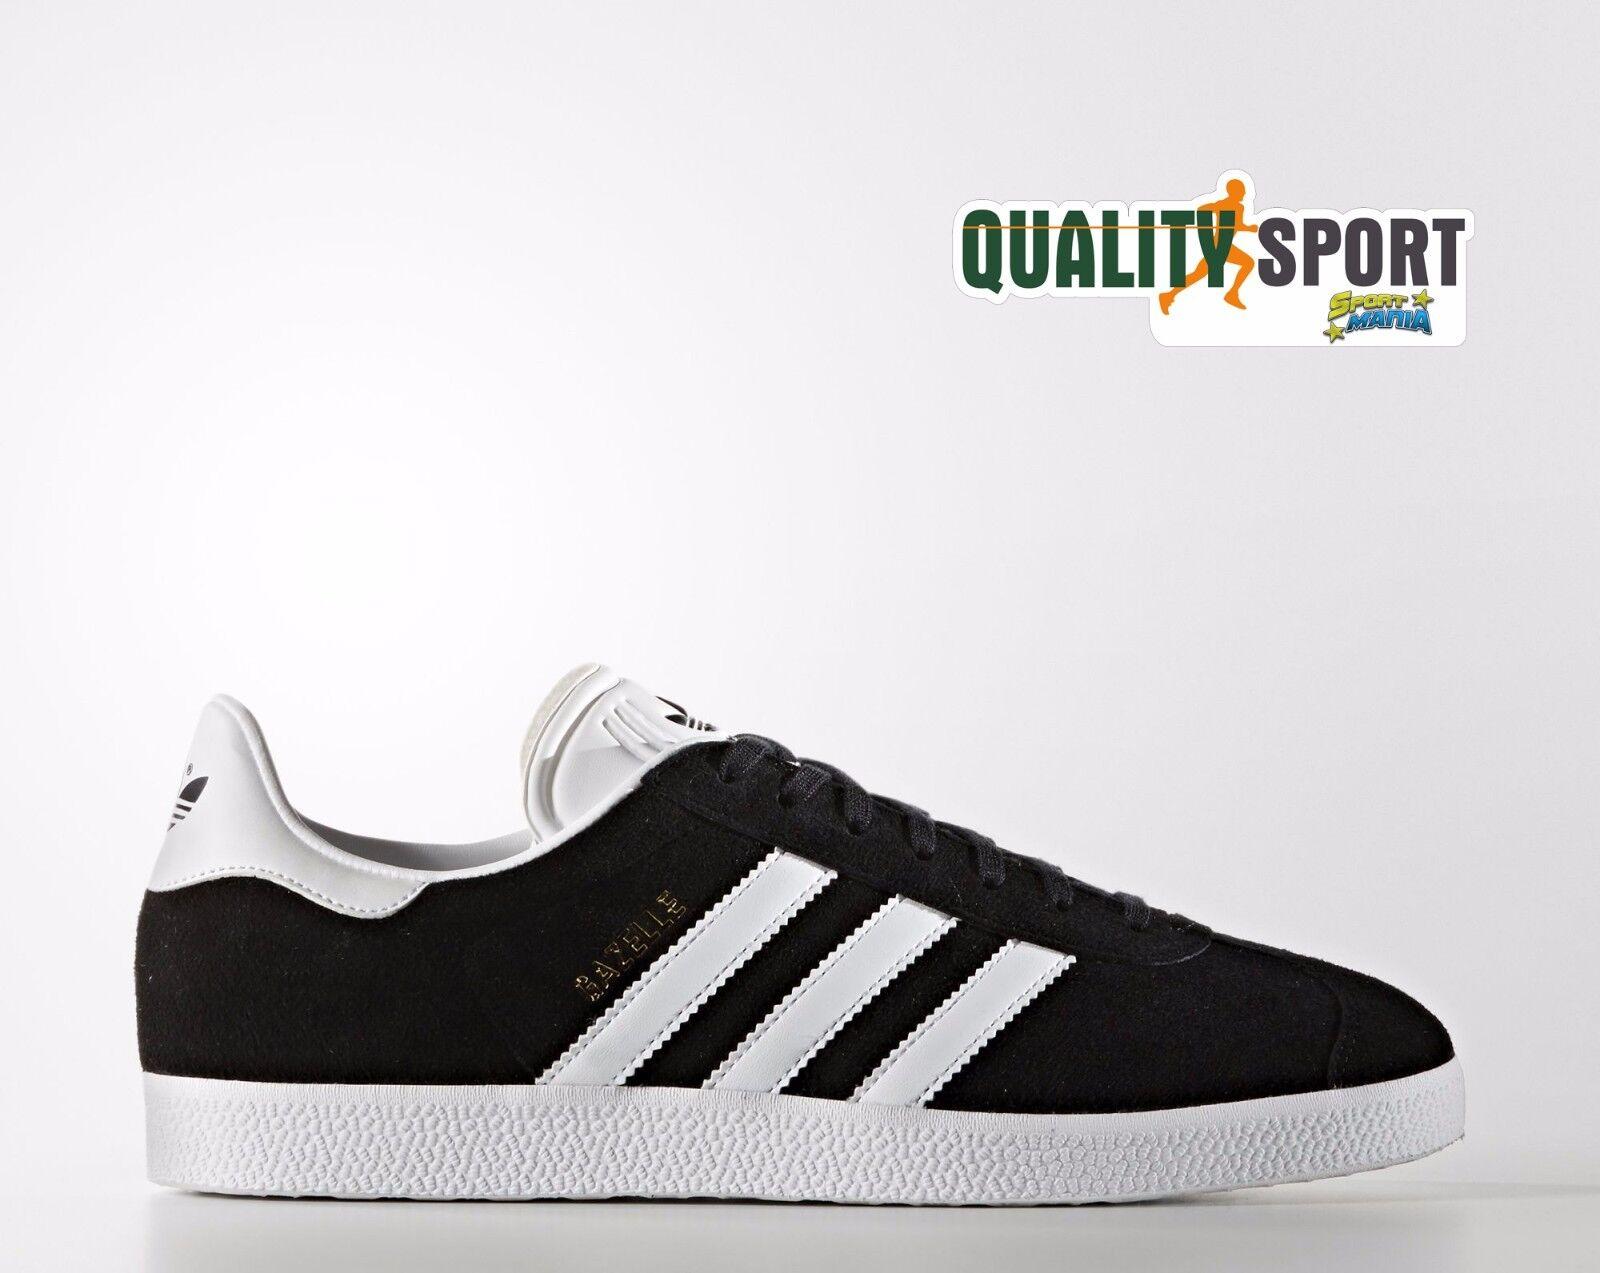 Adidas Gazelle Nero Uomo Scarpe Sportive Sneakers BB5476